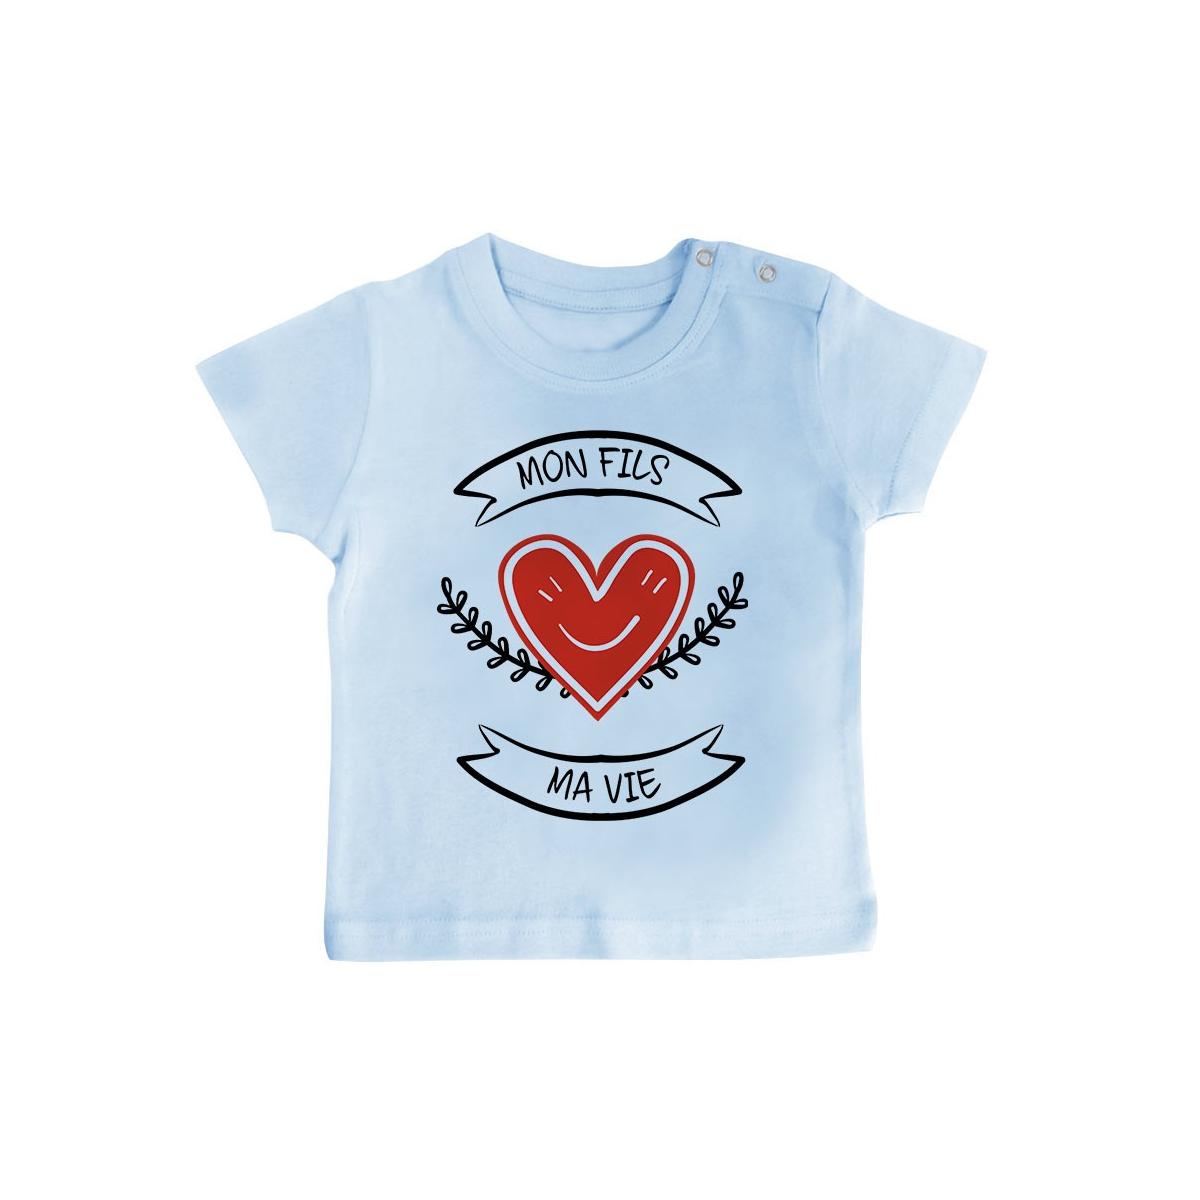 T-Shirt bébé Mon fils, ma vie